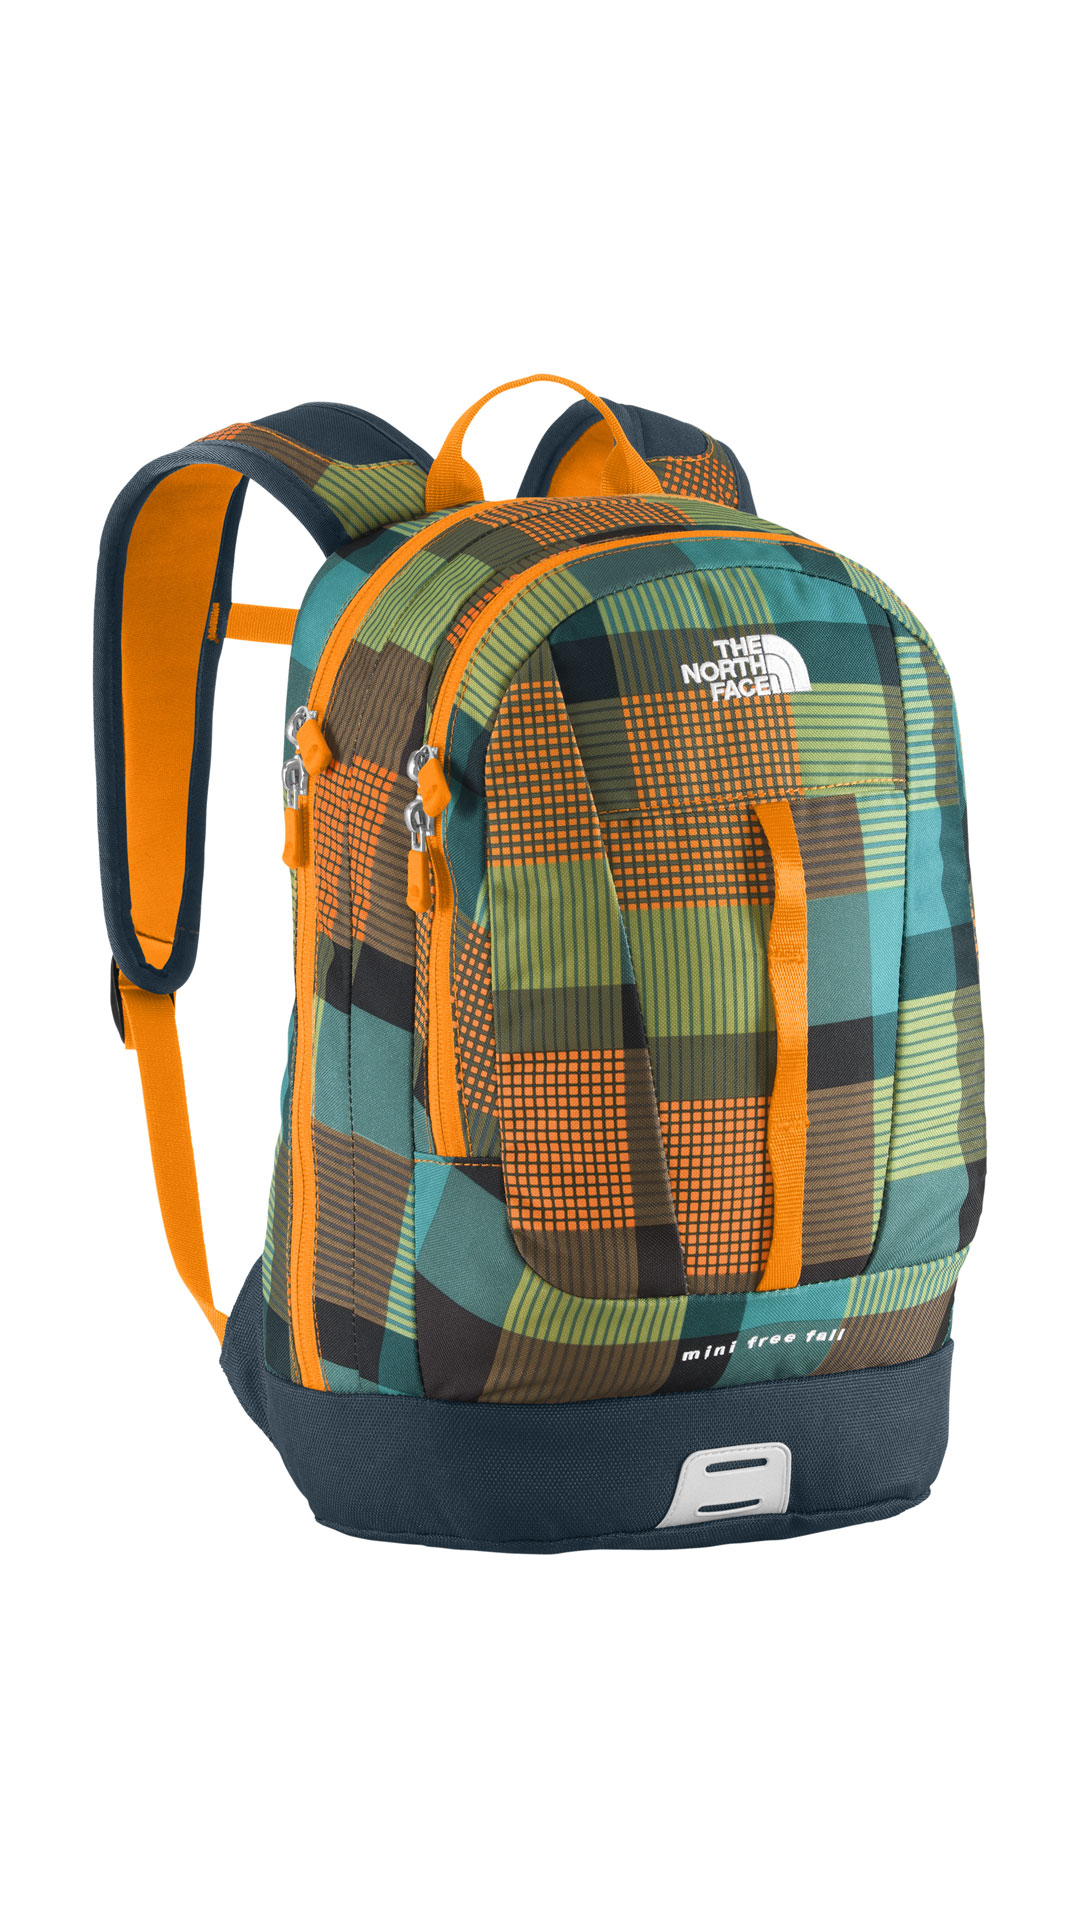 548b63b4c0c39_-_rbk-kids-backpacks-north-face-mini-free-fall-s2.jpg